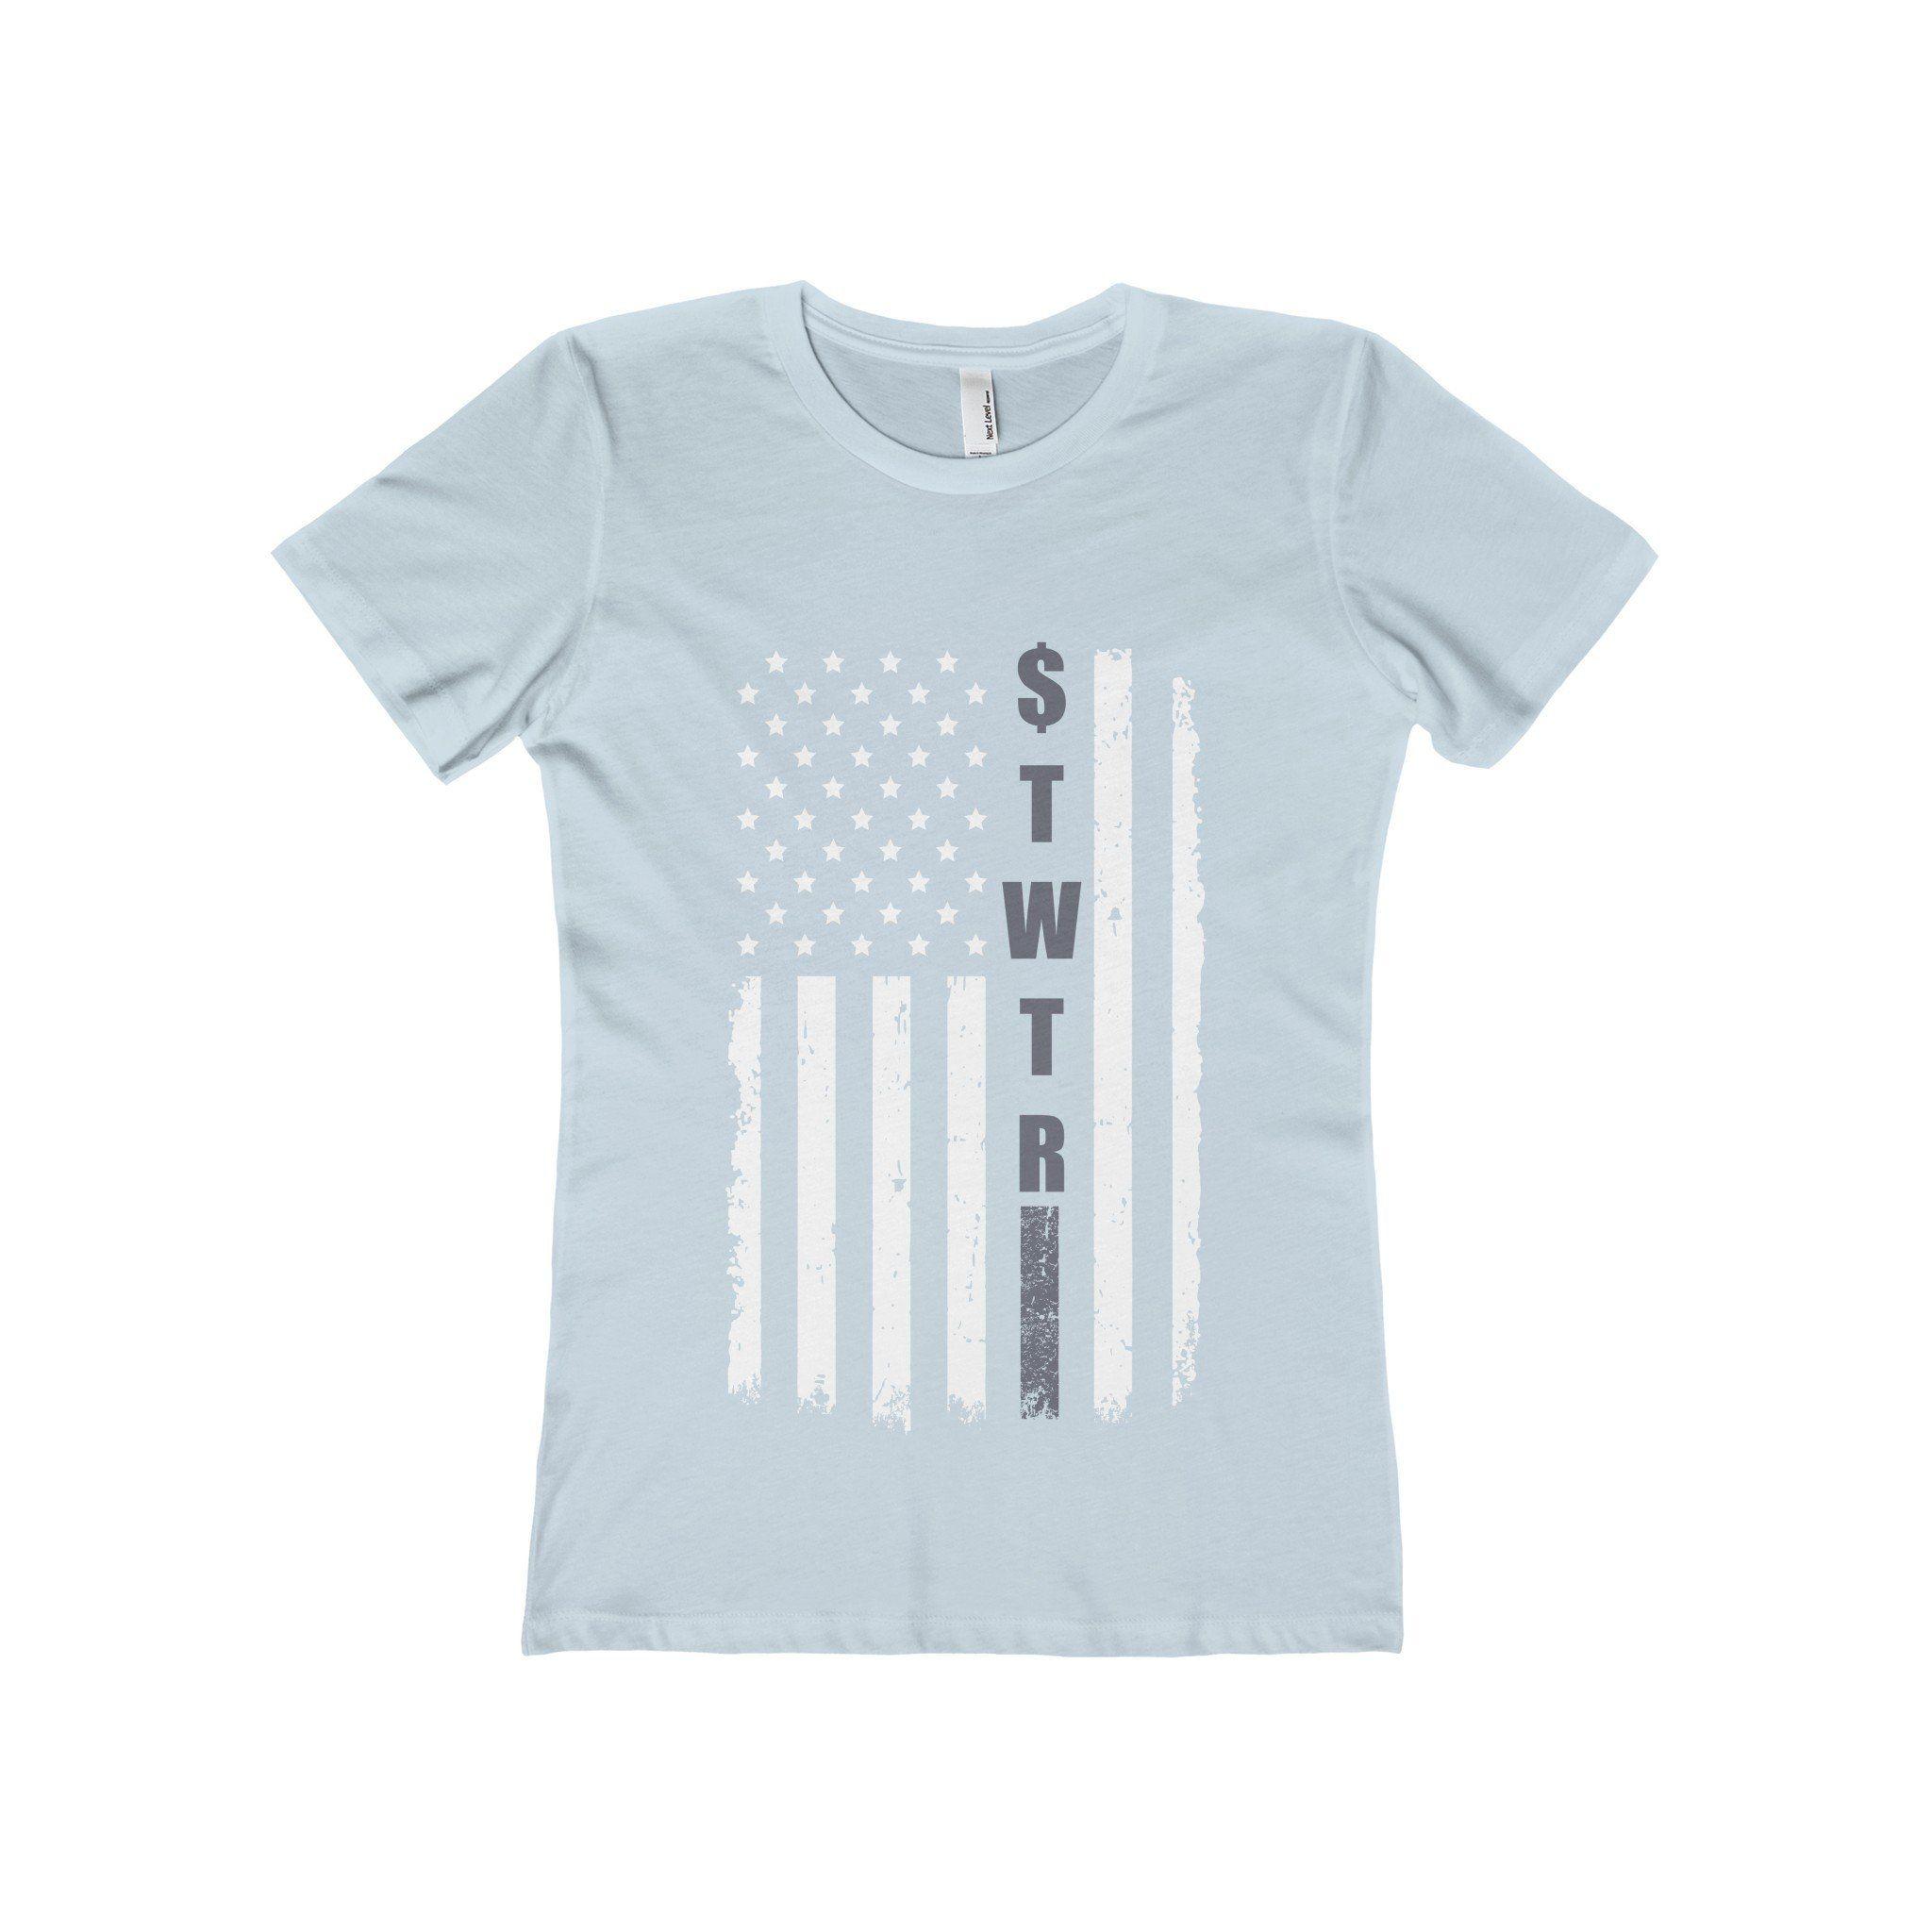 Twitter (Grey/White Flag) - Women's The Boyfriend Tee